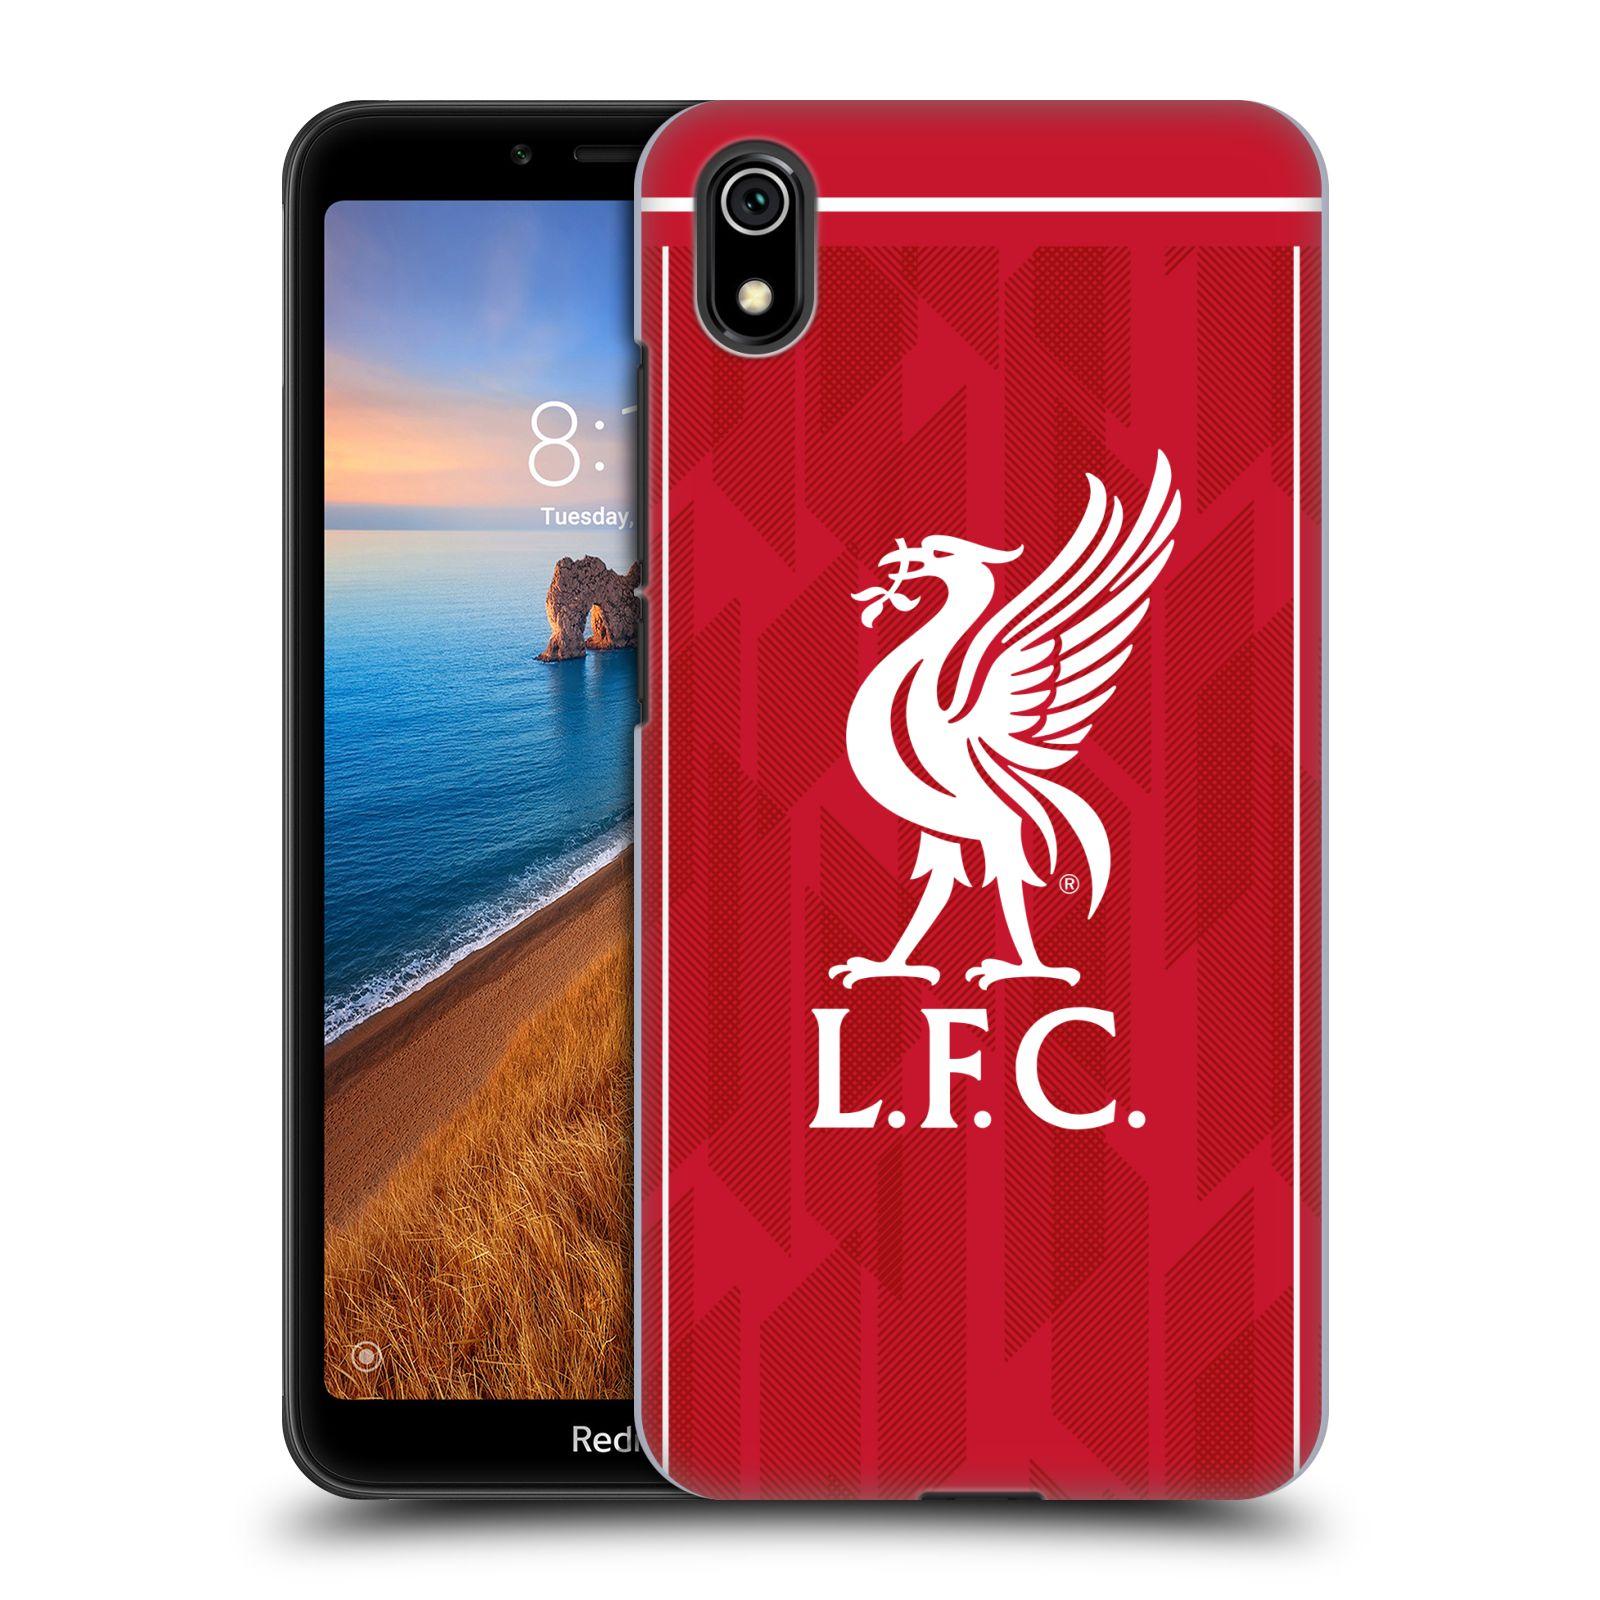 Plastové pouzdro na mobil Xiaomi Redmi 7A - Head Case - Liverpool FC - L.F.C. Home kit